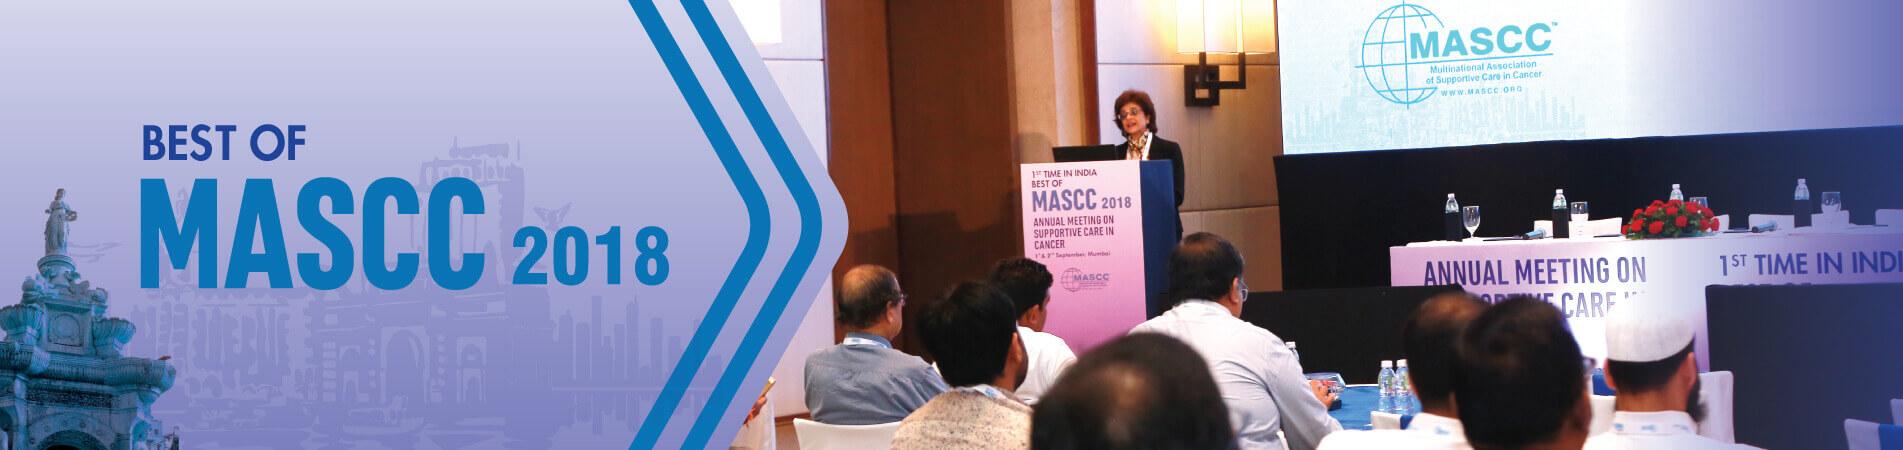 Best of MASCC 2019